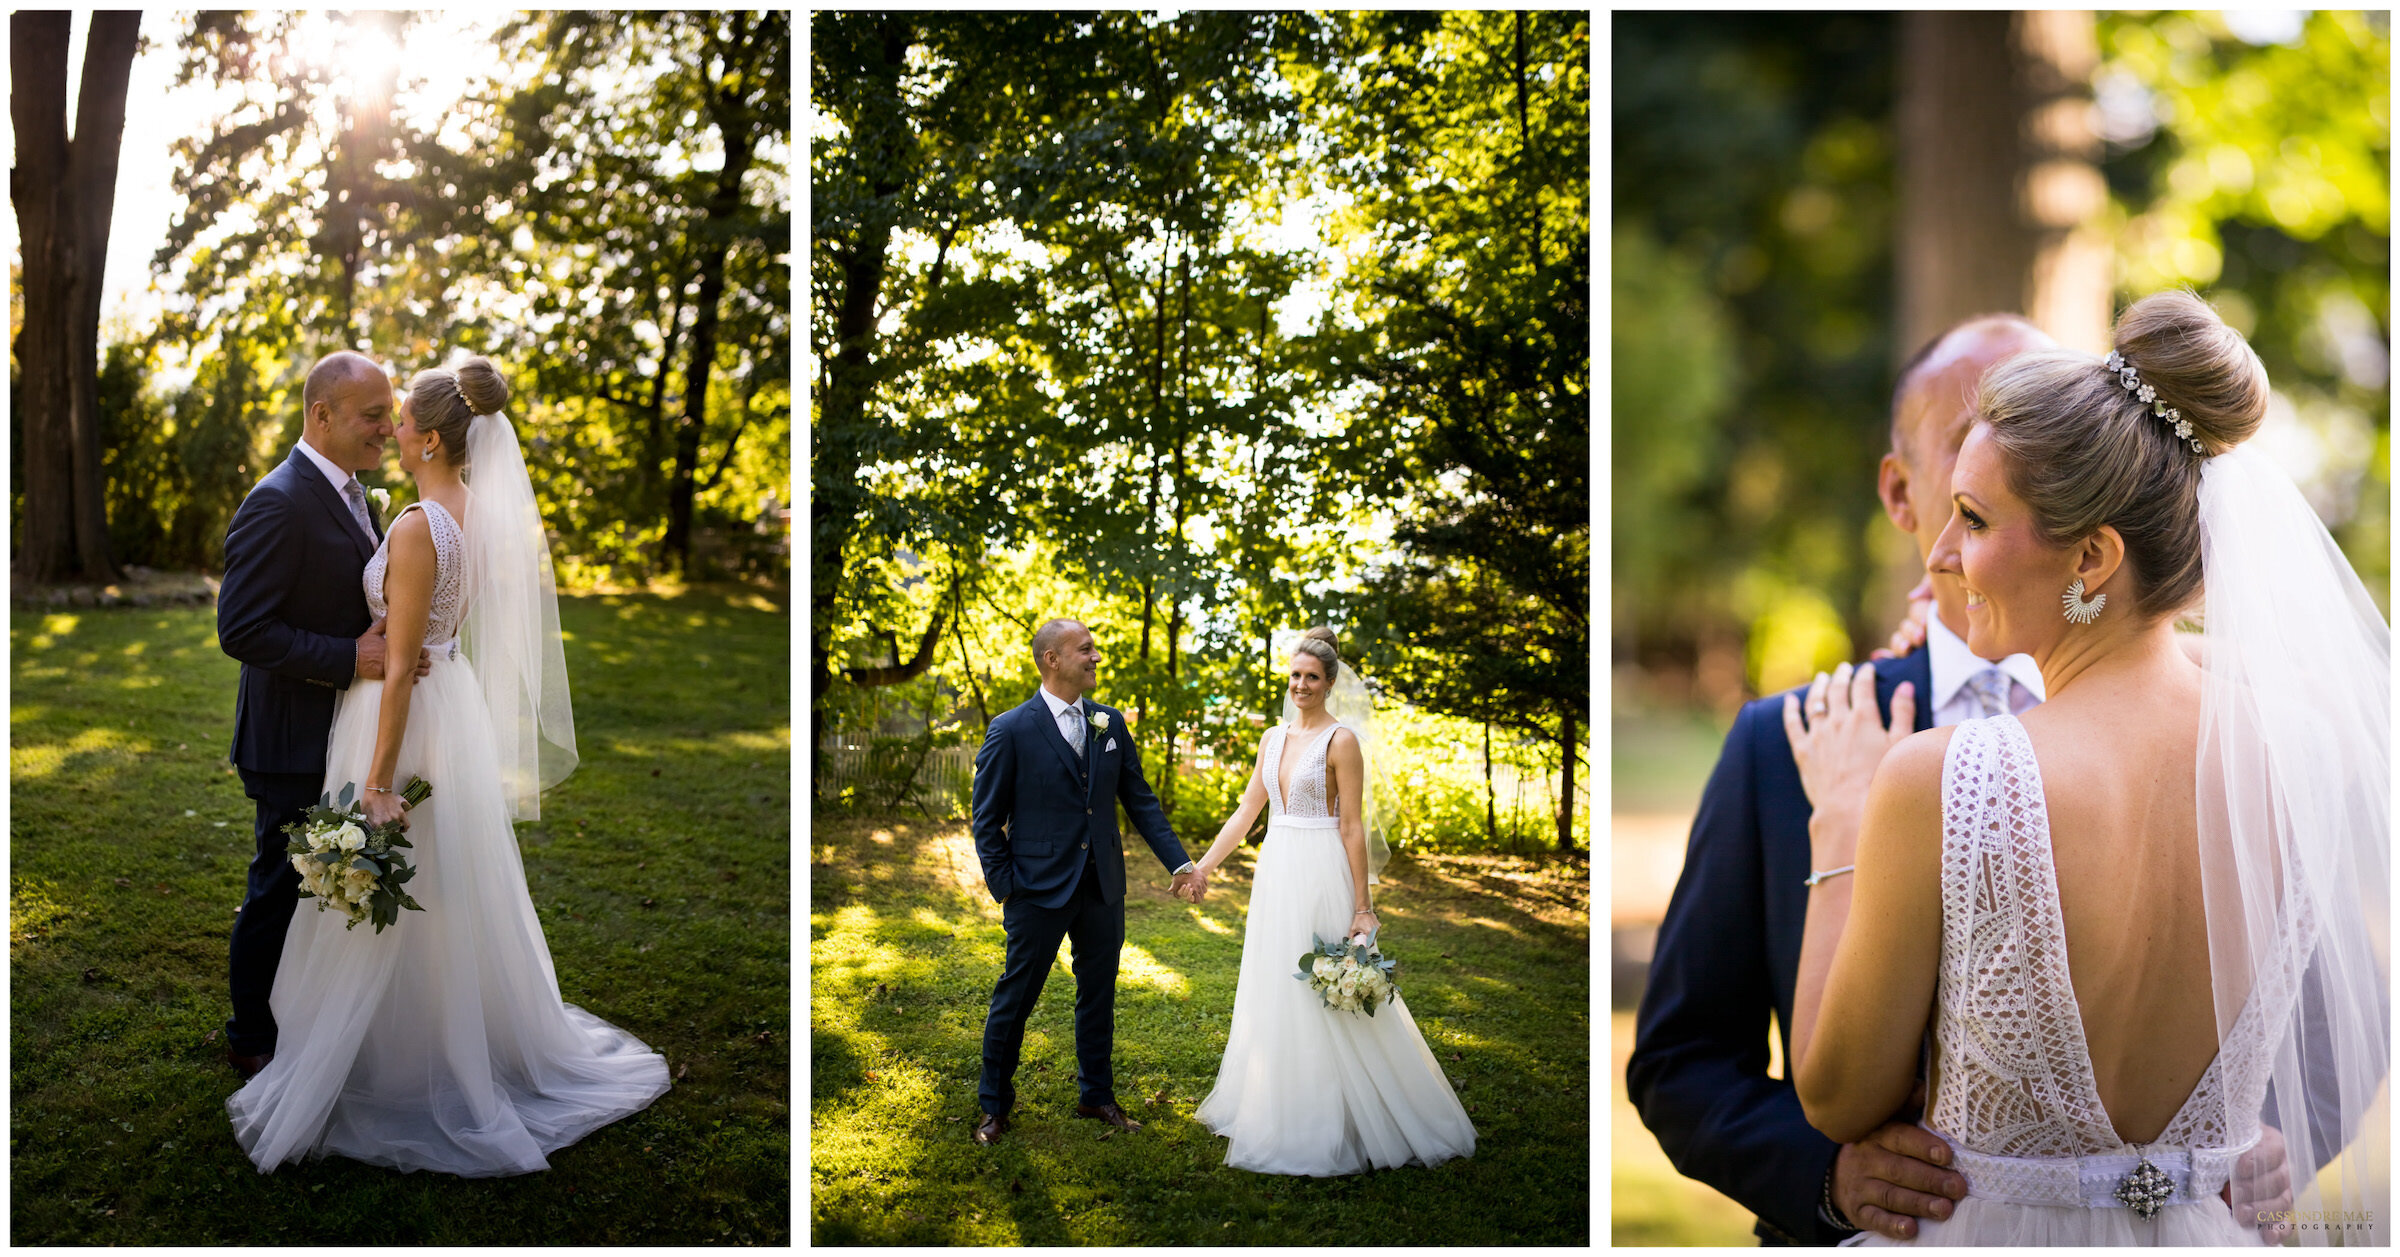 Cassondre Mae Photography Briarcliff Manor Wedding Photographer 3.jpg